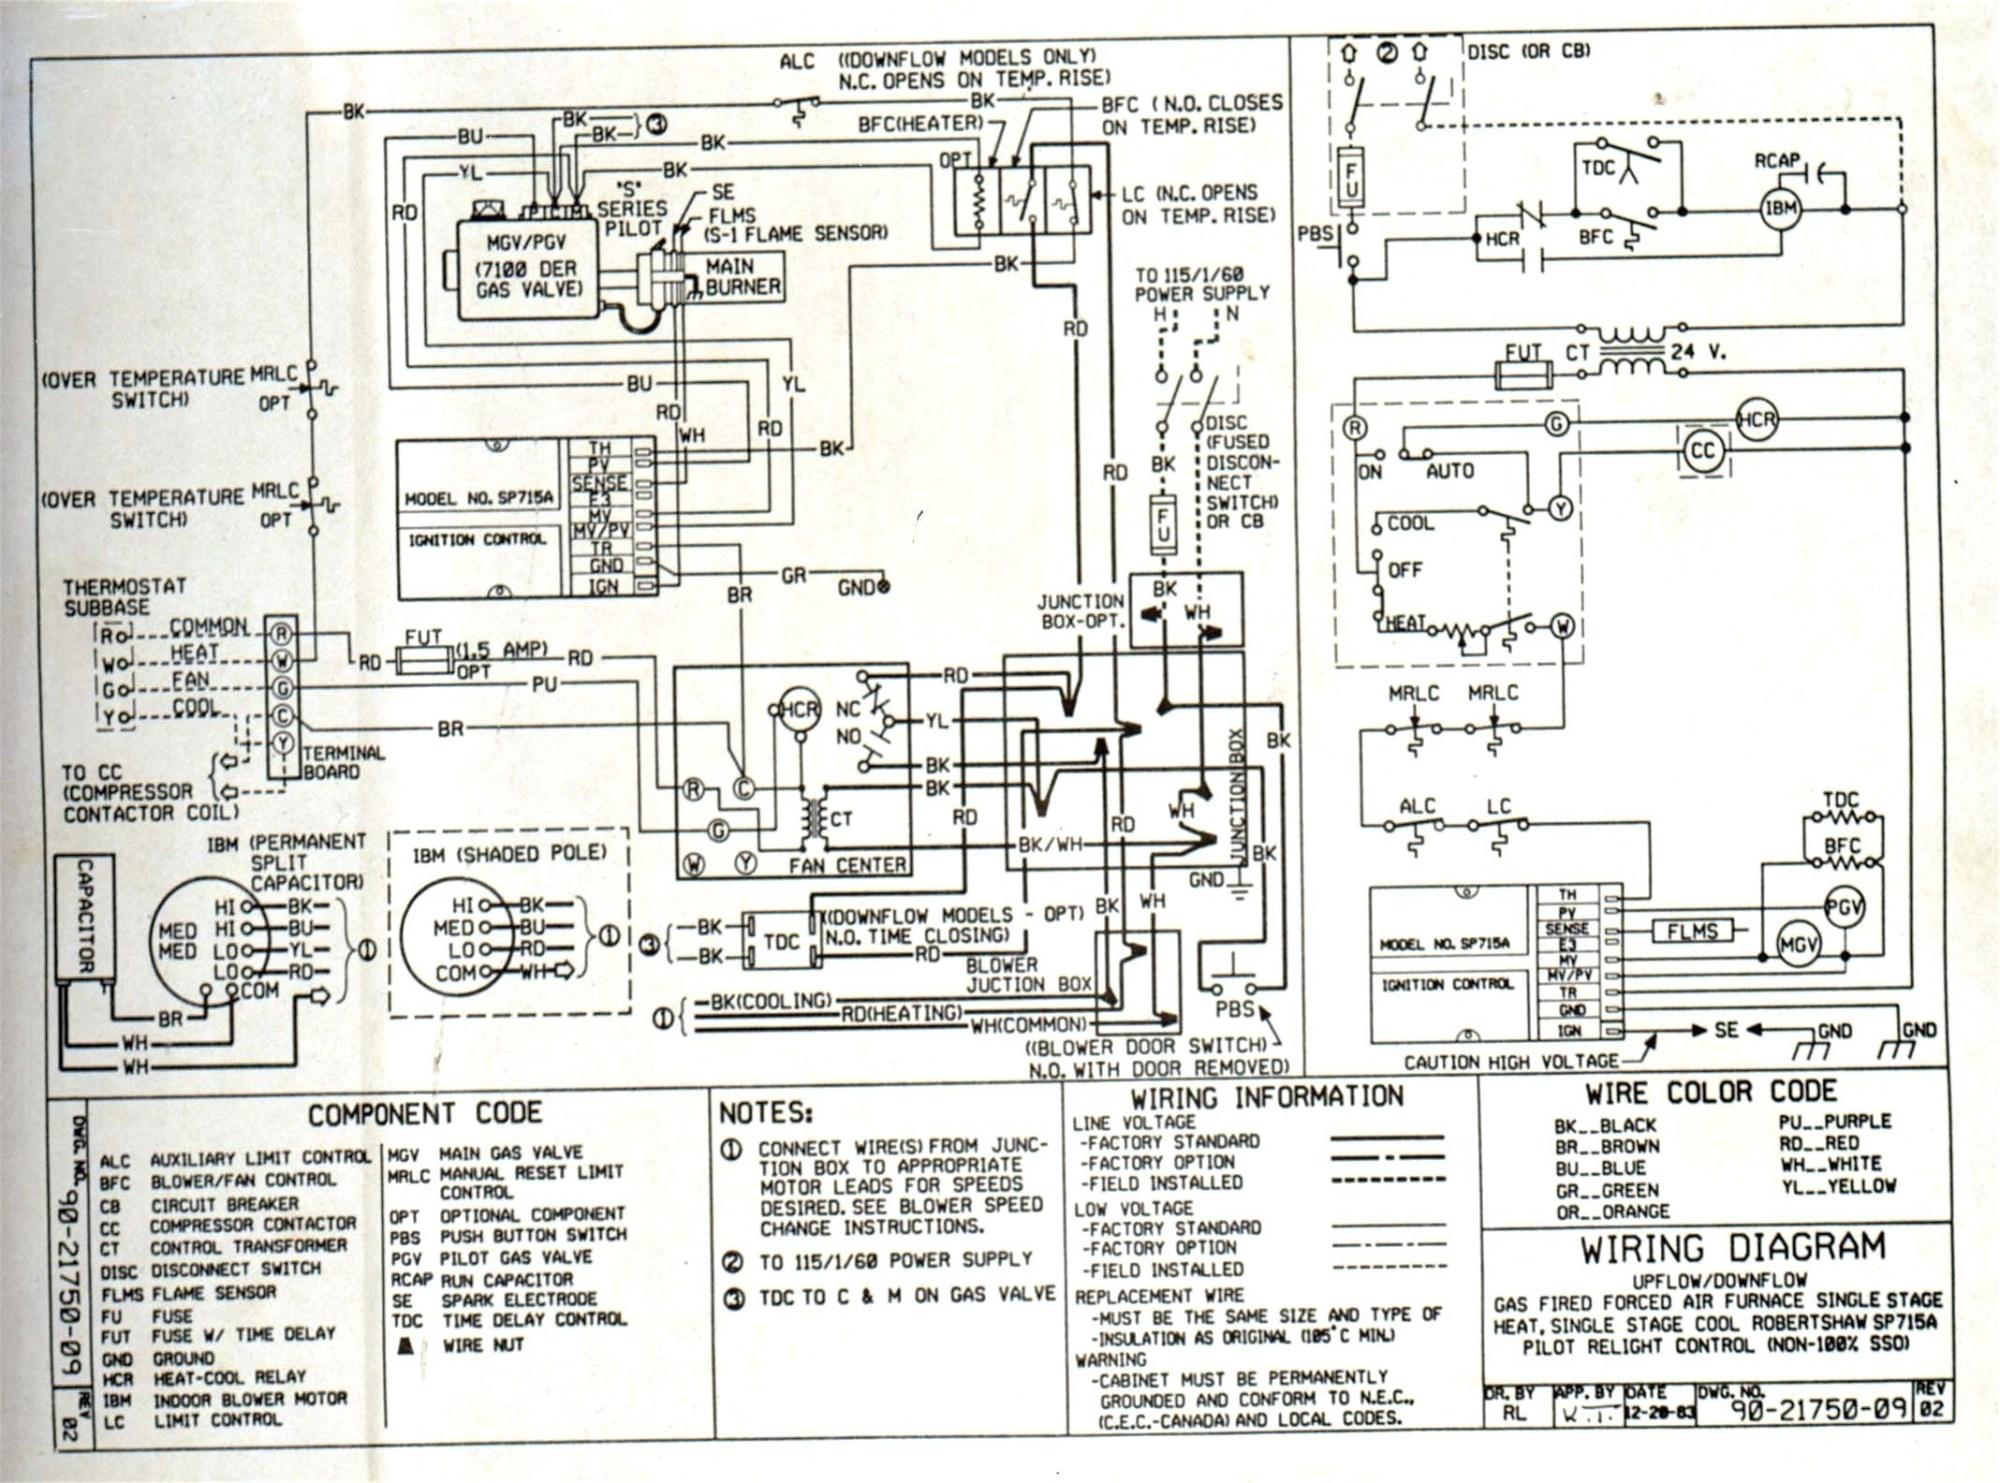 hight resolution of honda beat motorcycle wiring diagram fresh honda beat scooter wiring diagram best wiring diagram kelistrikan ac inspirational big dog